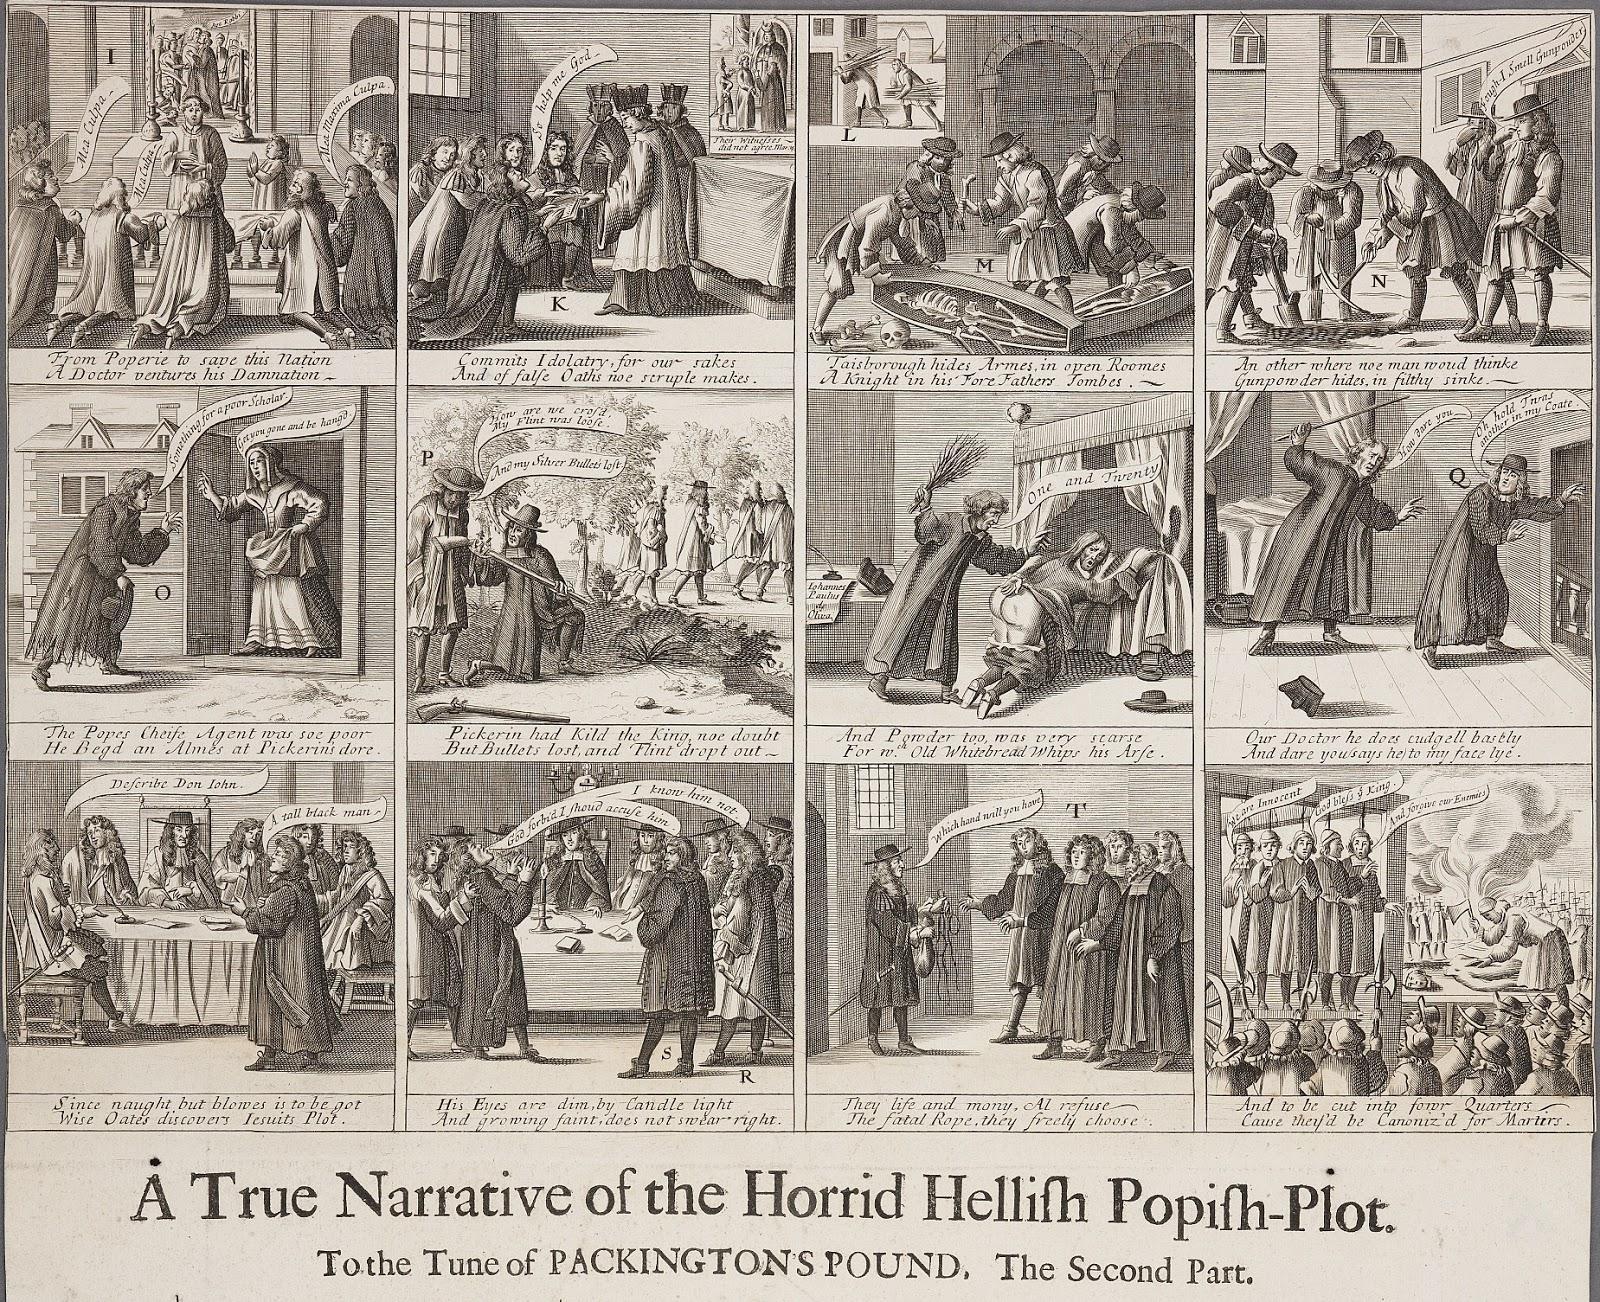 « The Horrid Hellish Popish Plot' » par Francis Barlow, en 1682.